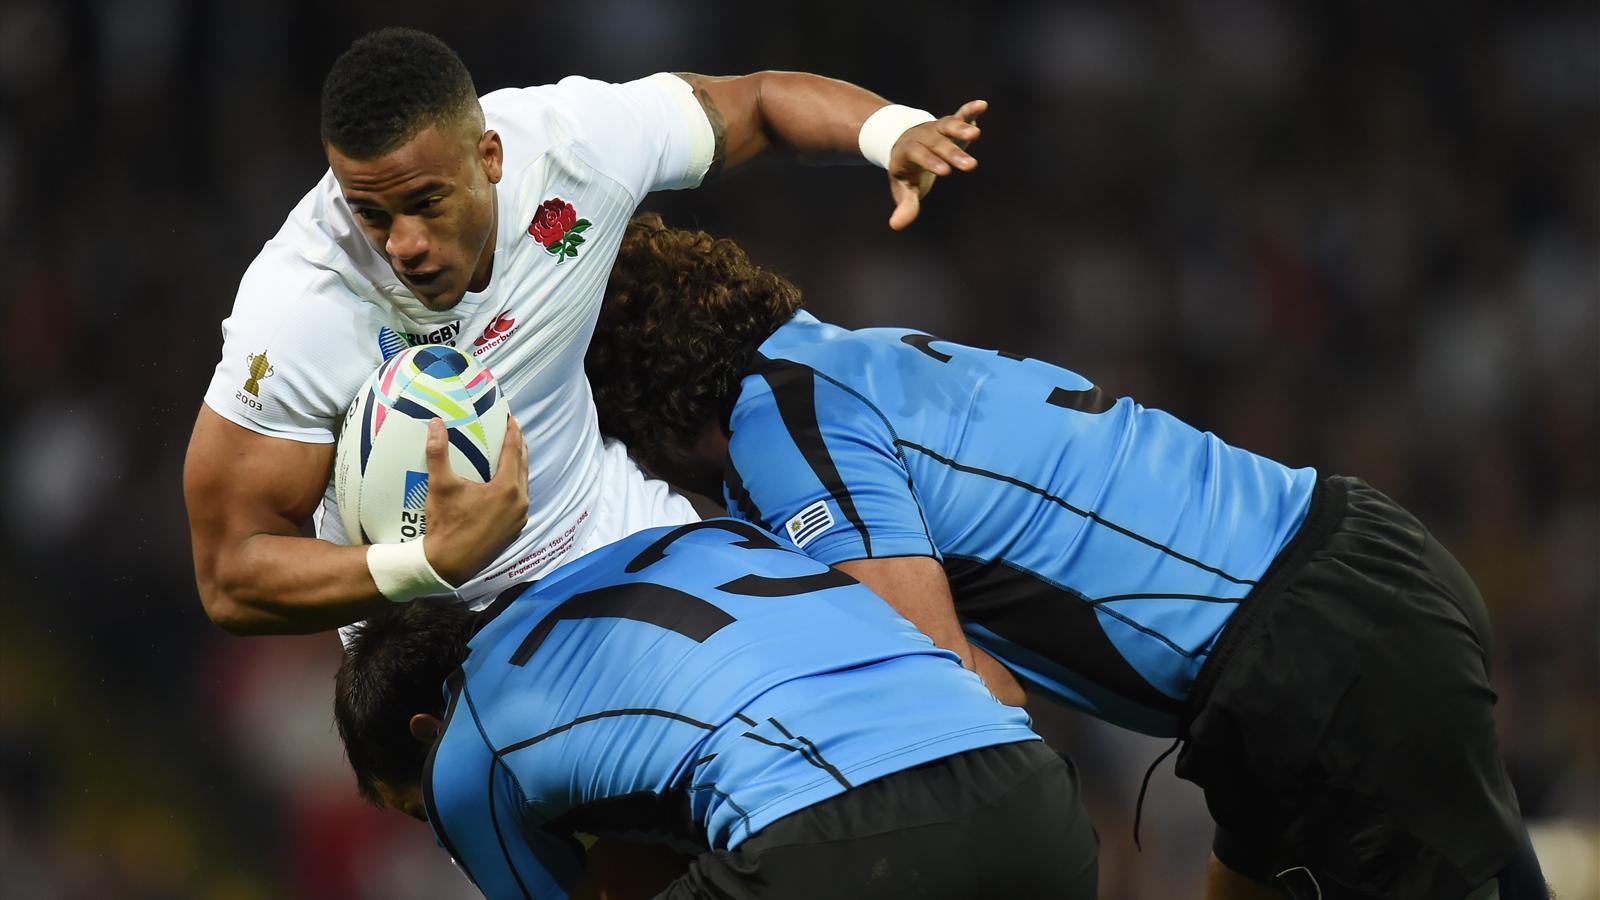 Anthony Watson (Angleterre) face à l'Uruguay - 10 octobre 2015